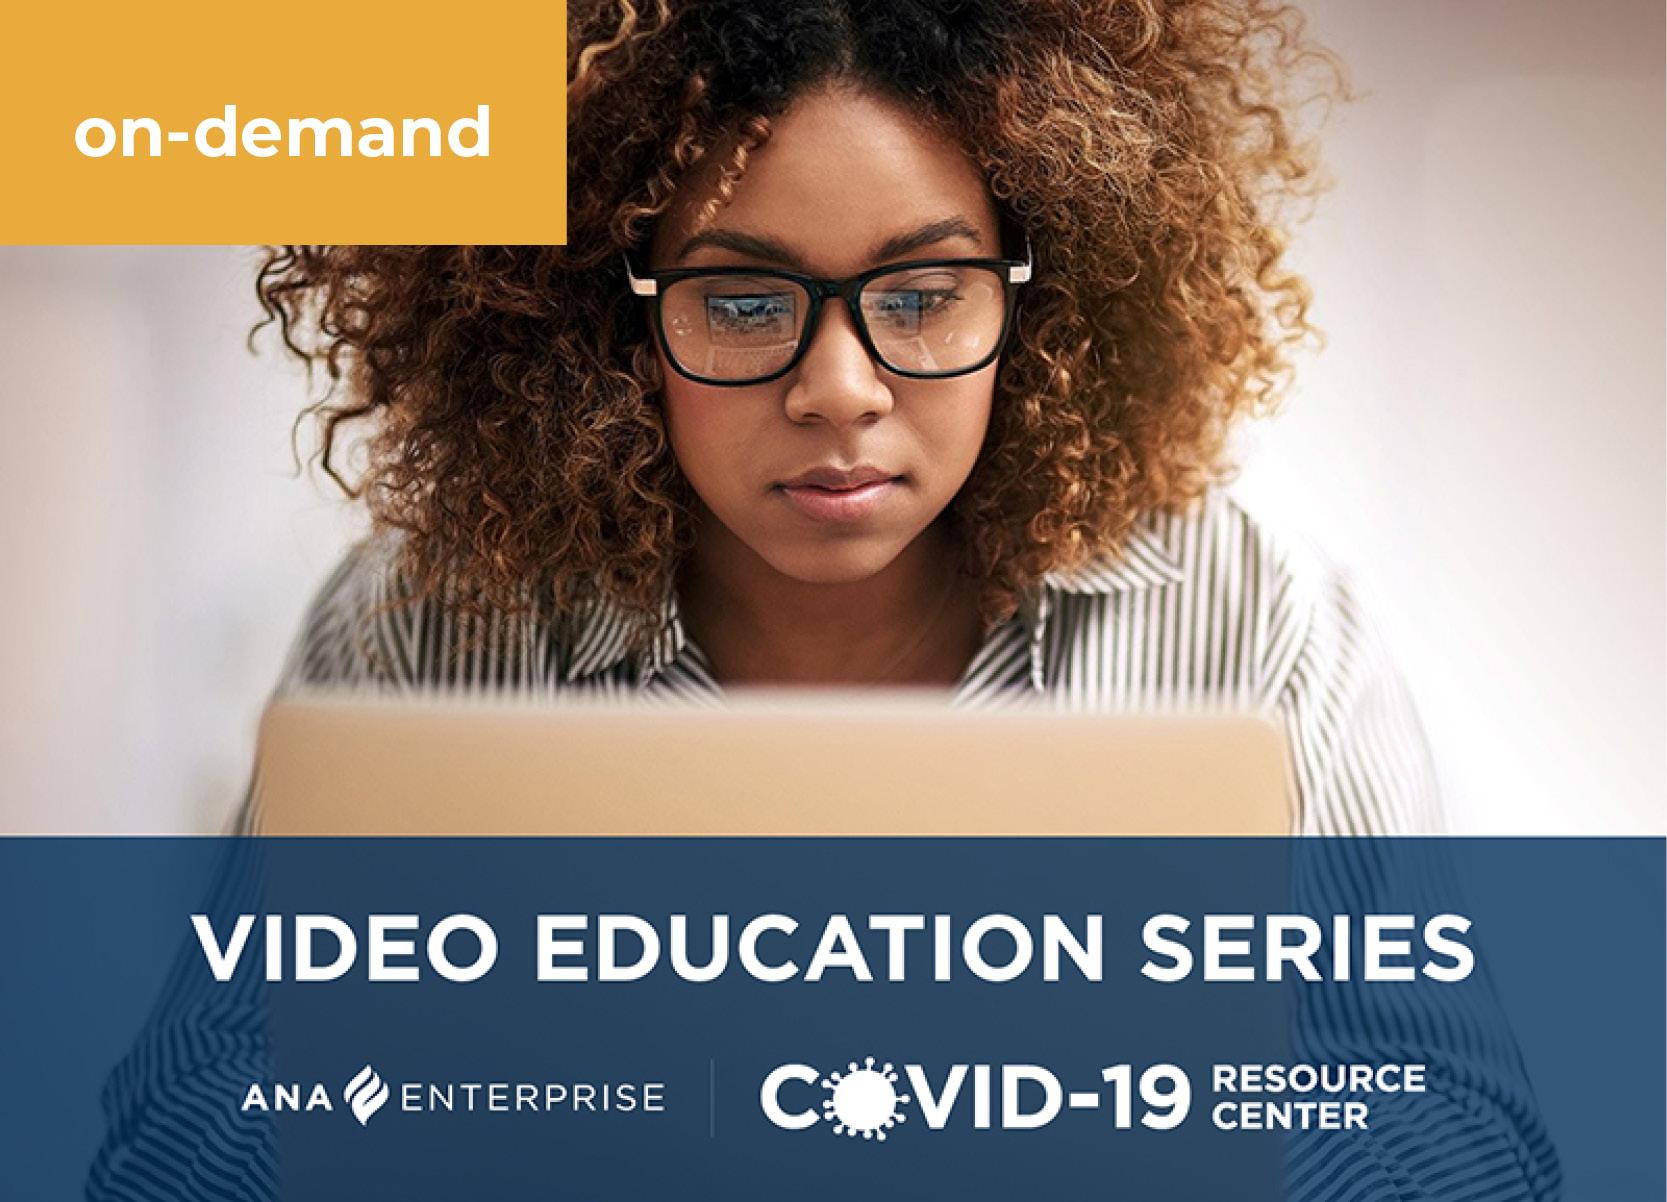 ANA's COVID-19 Video Education Series